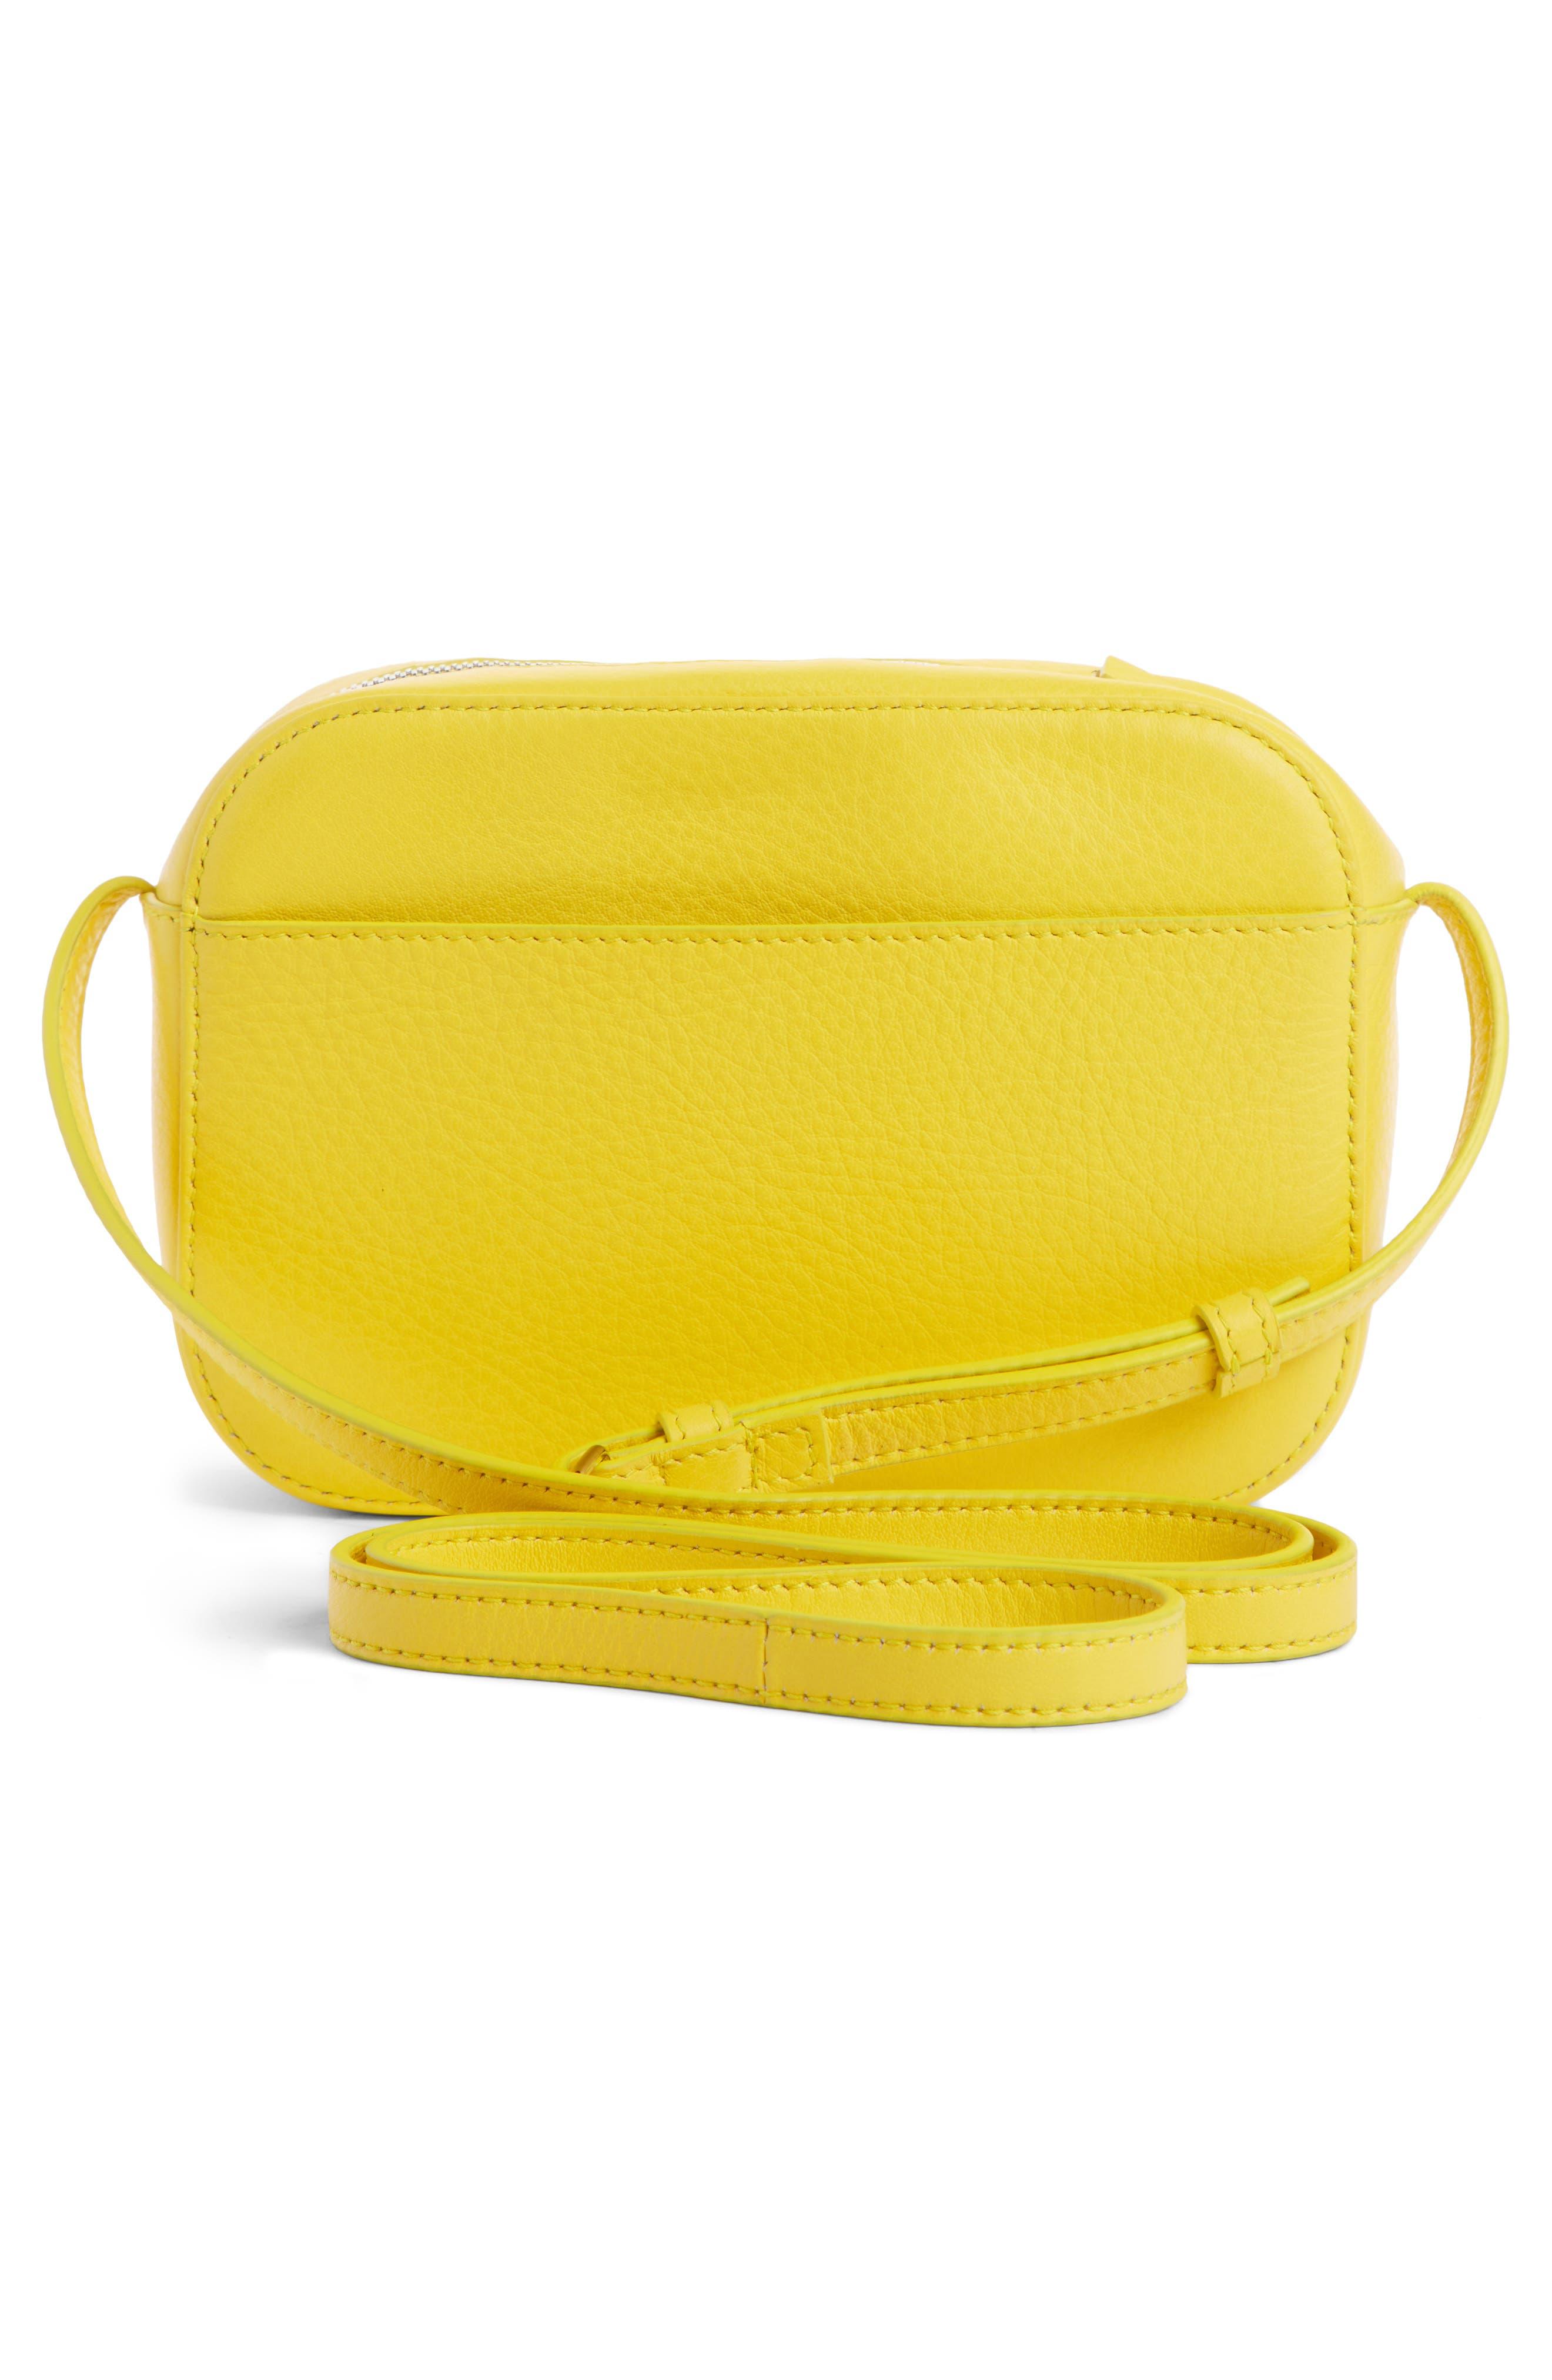 BALENCIAGA,                             Extra Small Everyday Calfskin Camera Bag,                             Alternate thumbnail 3, color,                             JAUNE SOLEIL/ NOIR